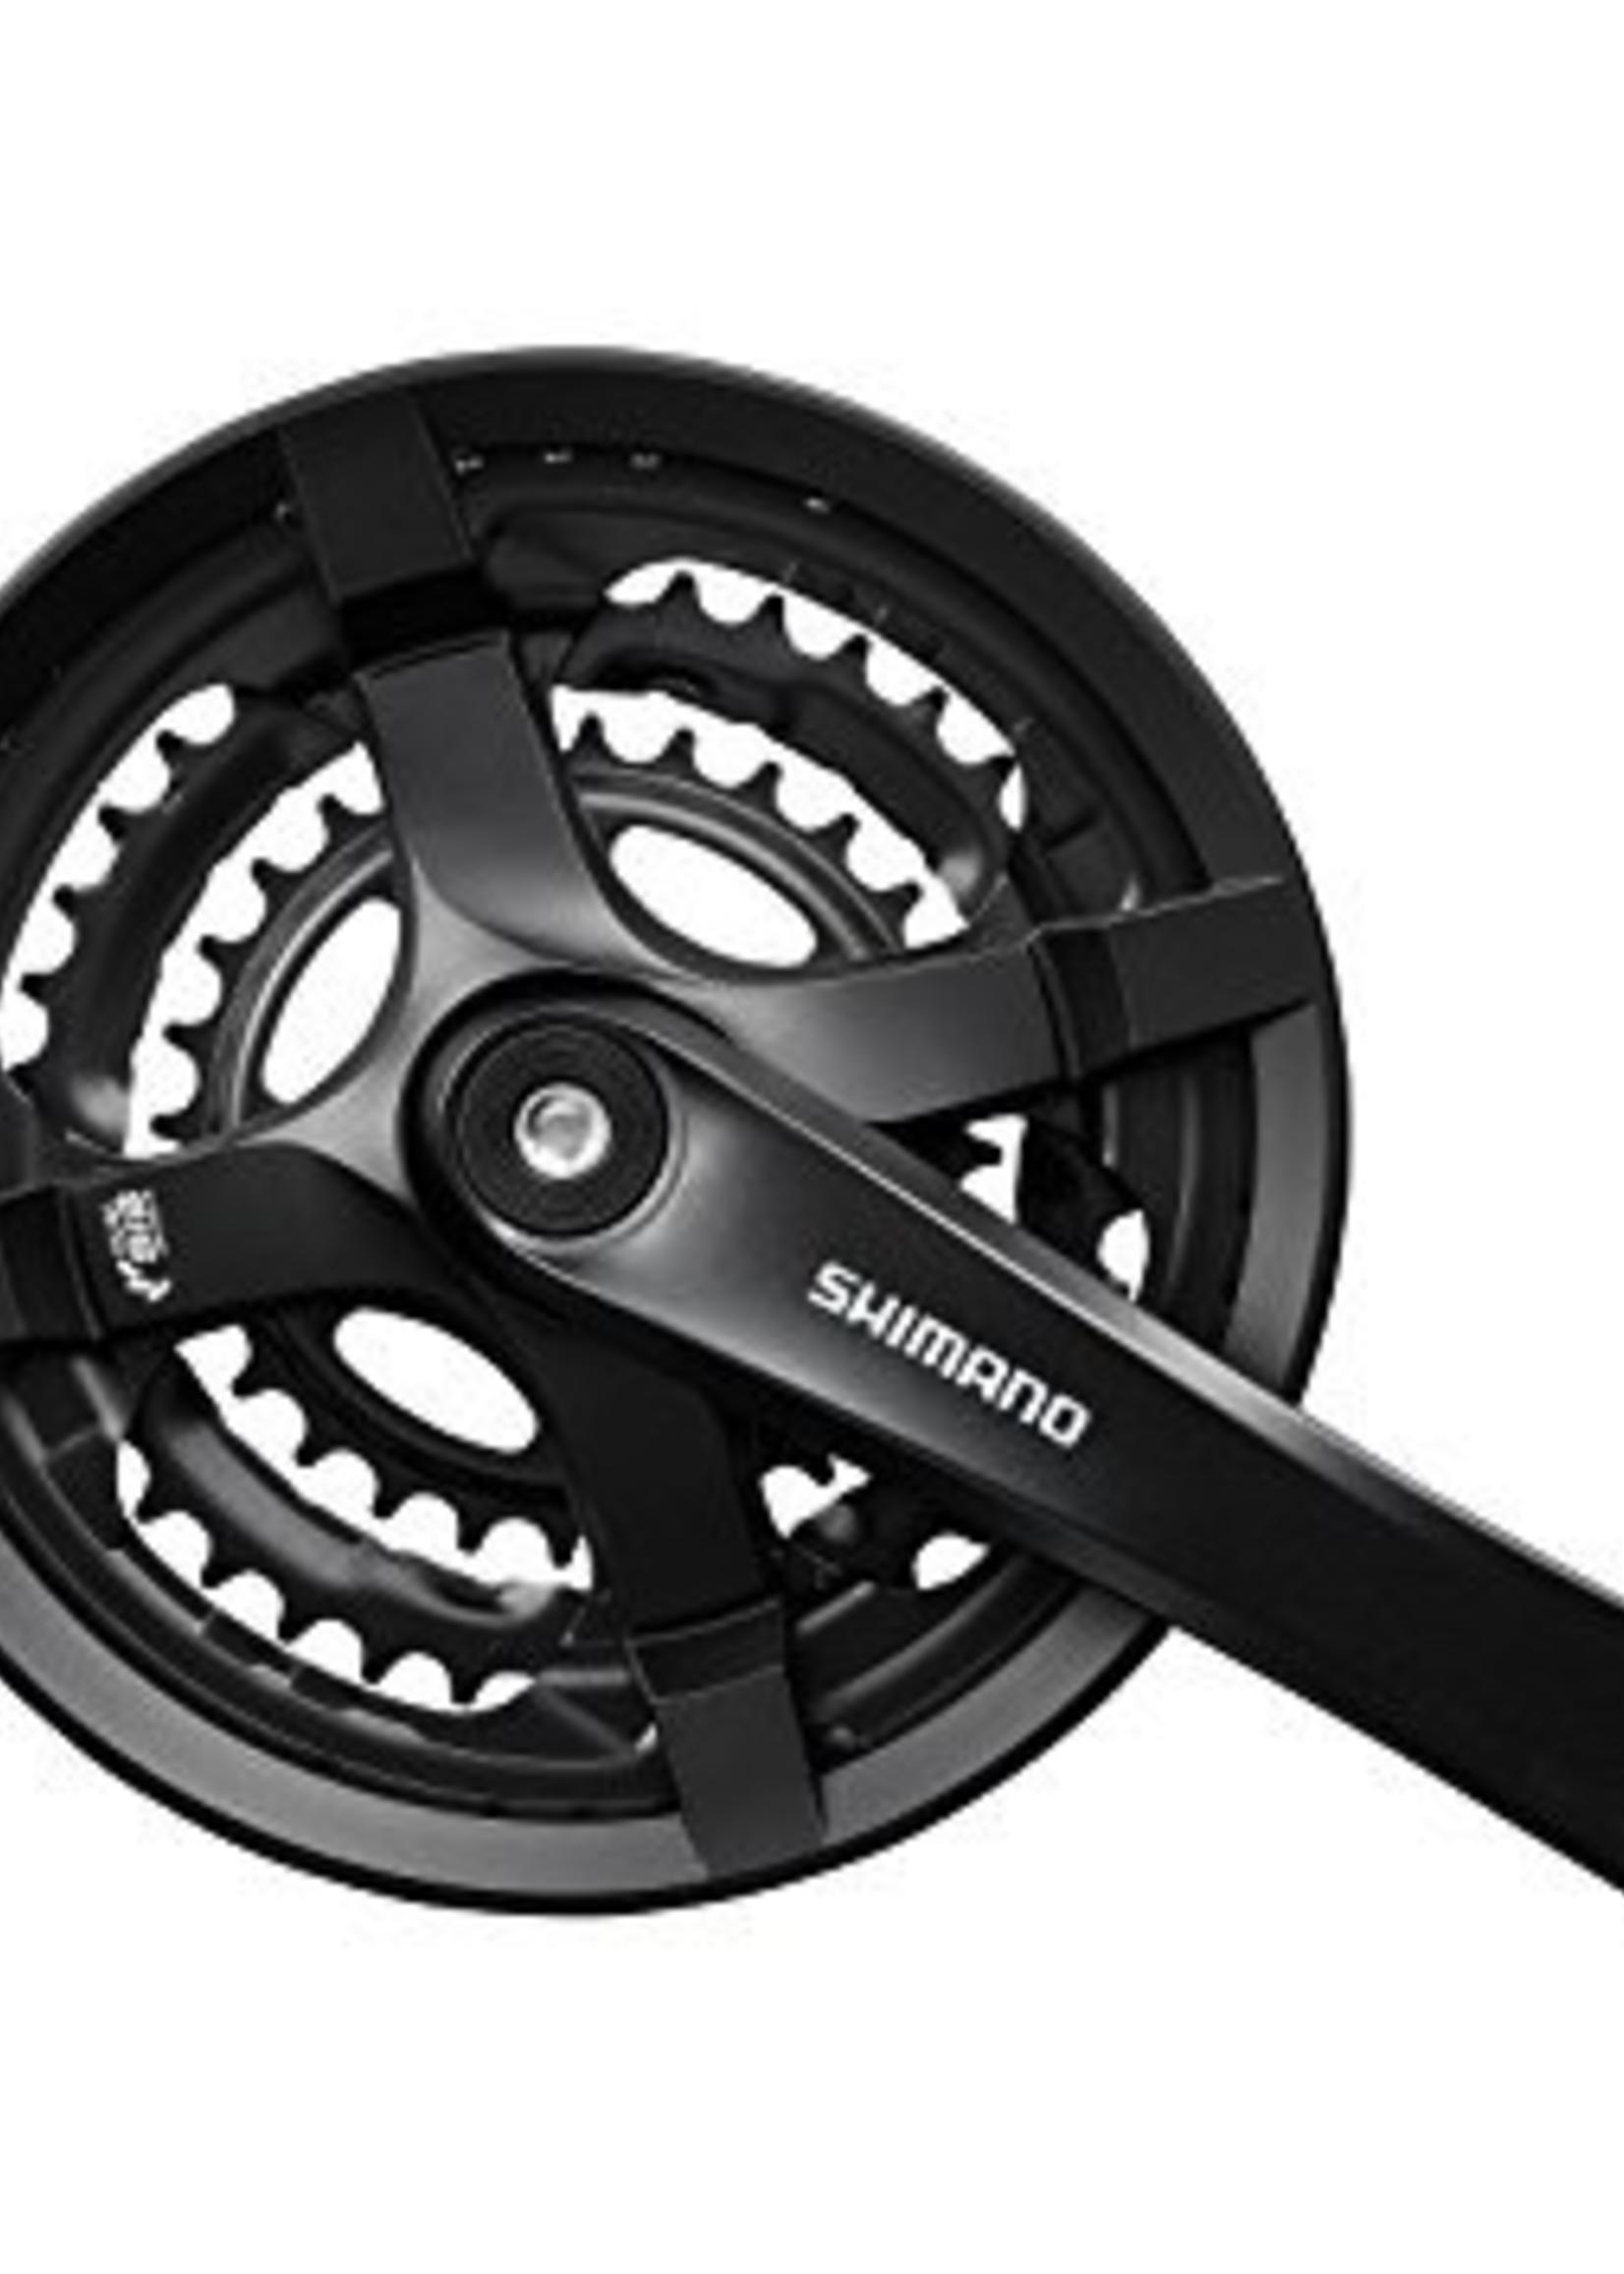 Shimano SHIMANO FC-TY501 CRANK CHAIN RING